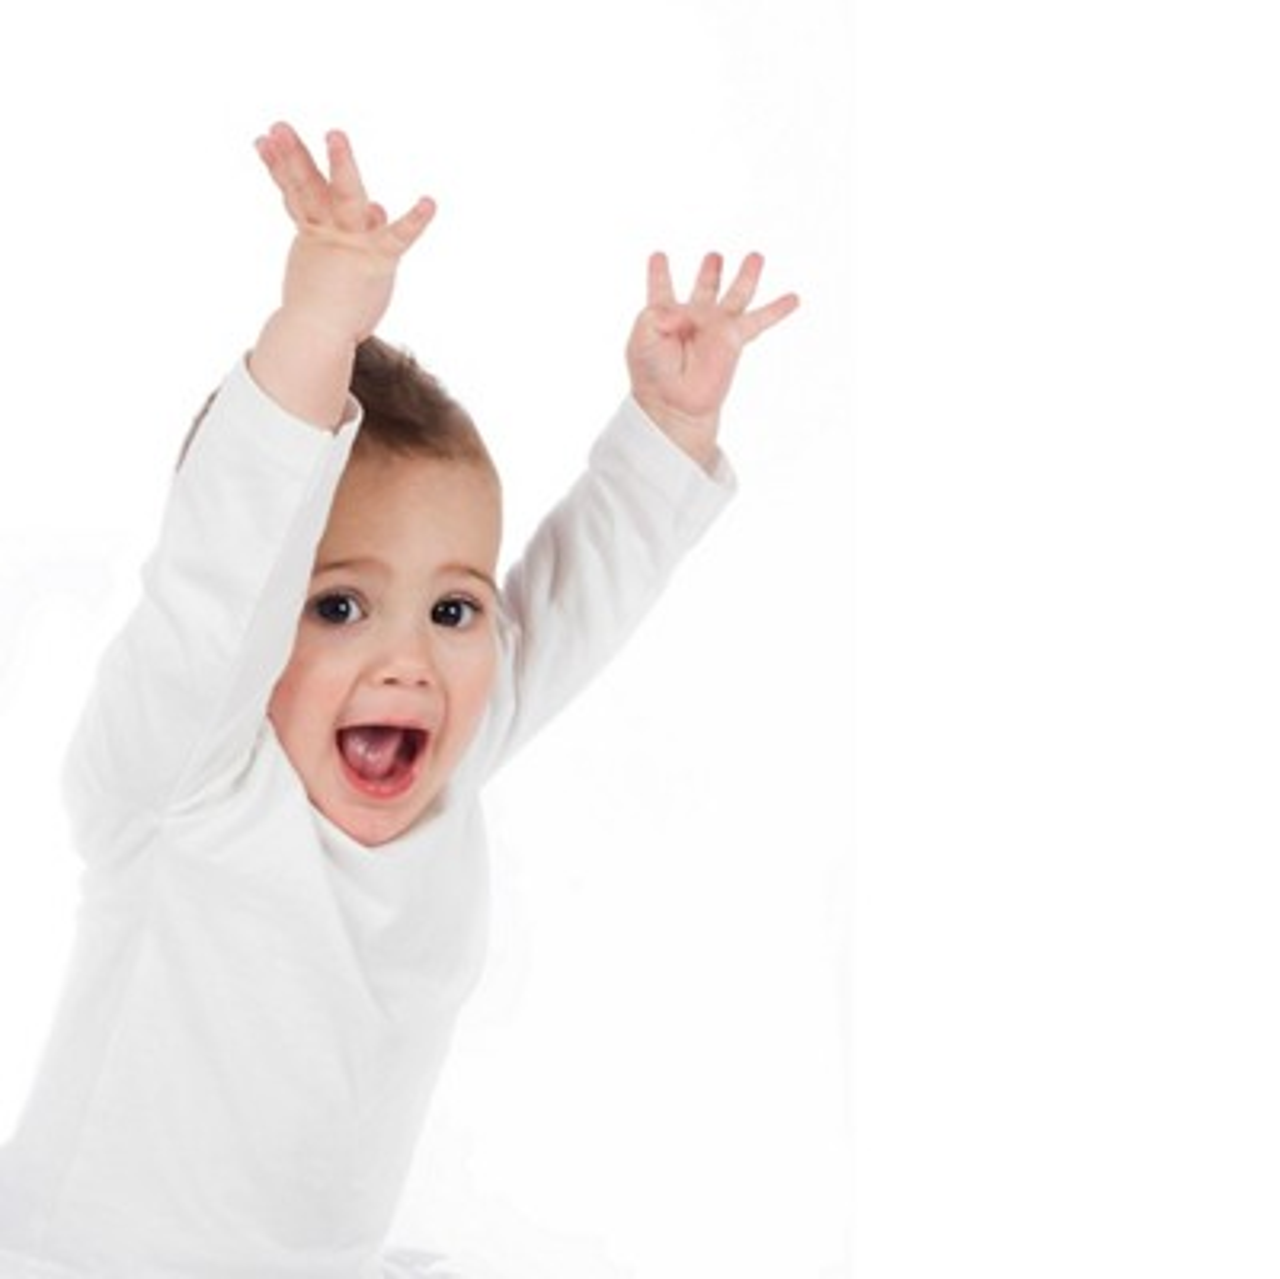 Toddler hands up